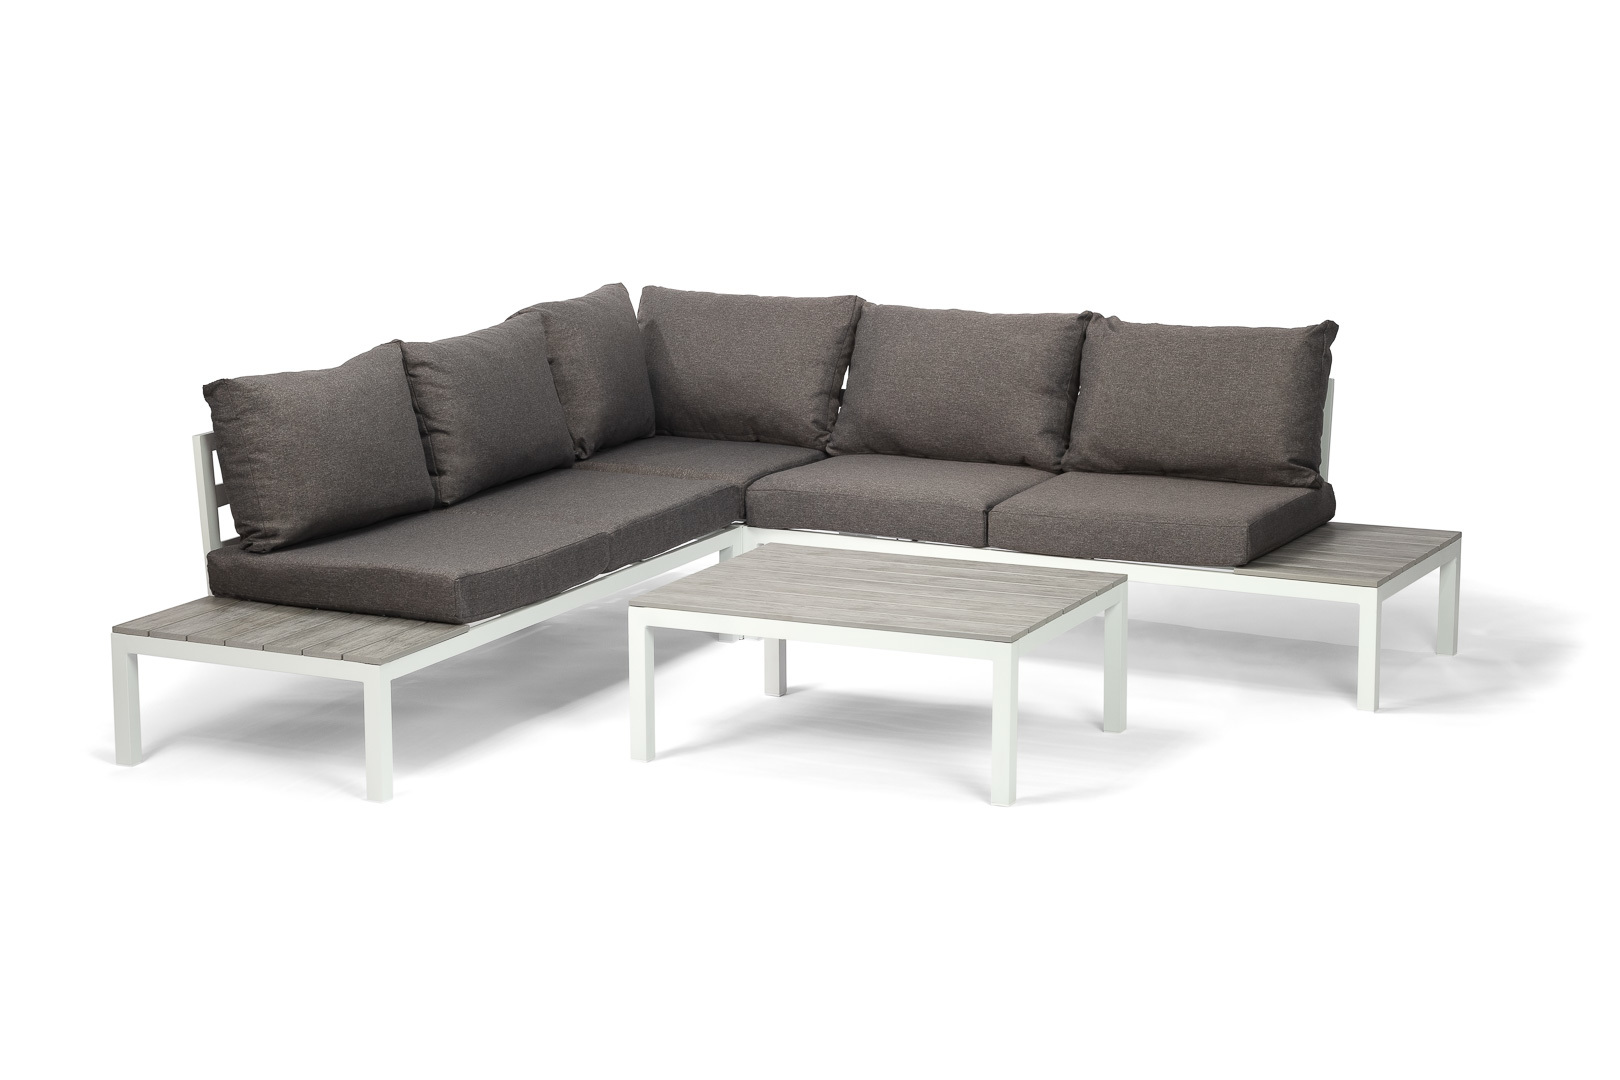 Luxusní sofa GENOVA šedá